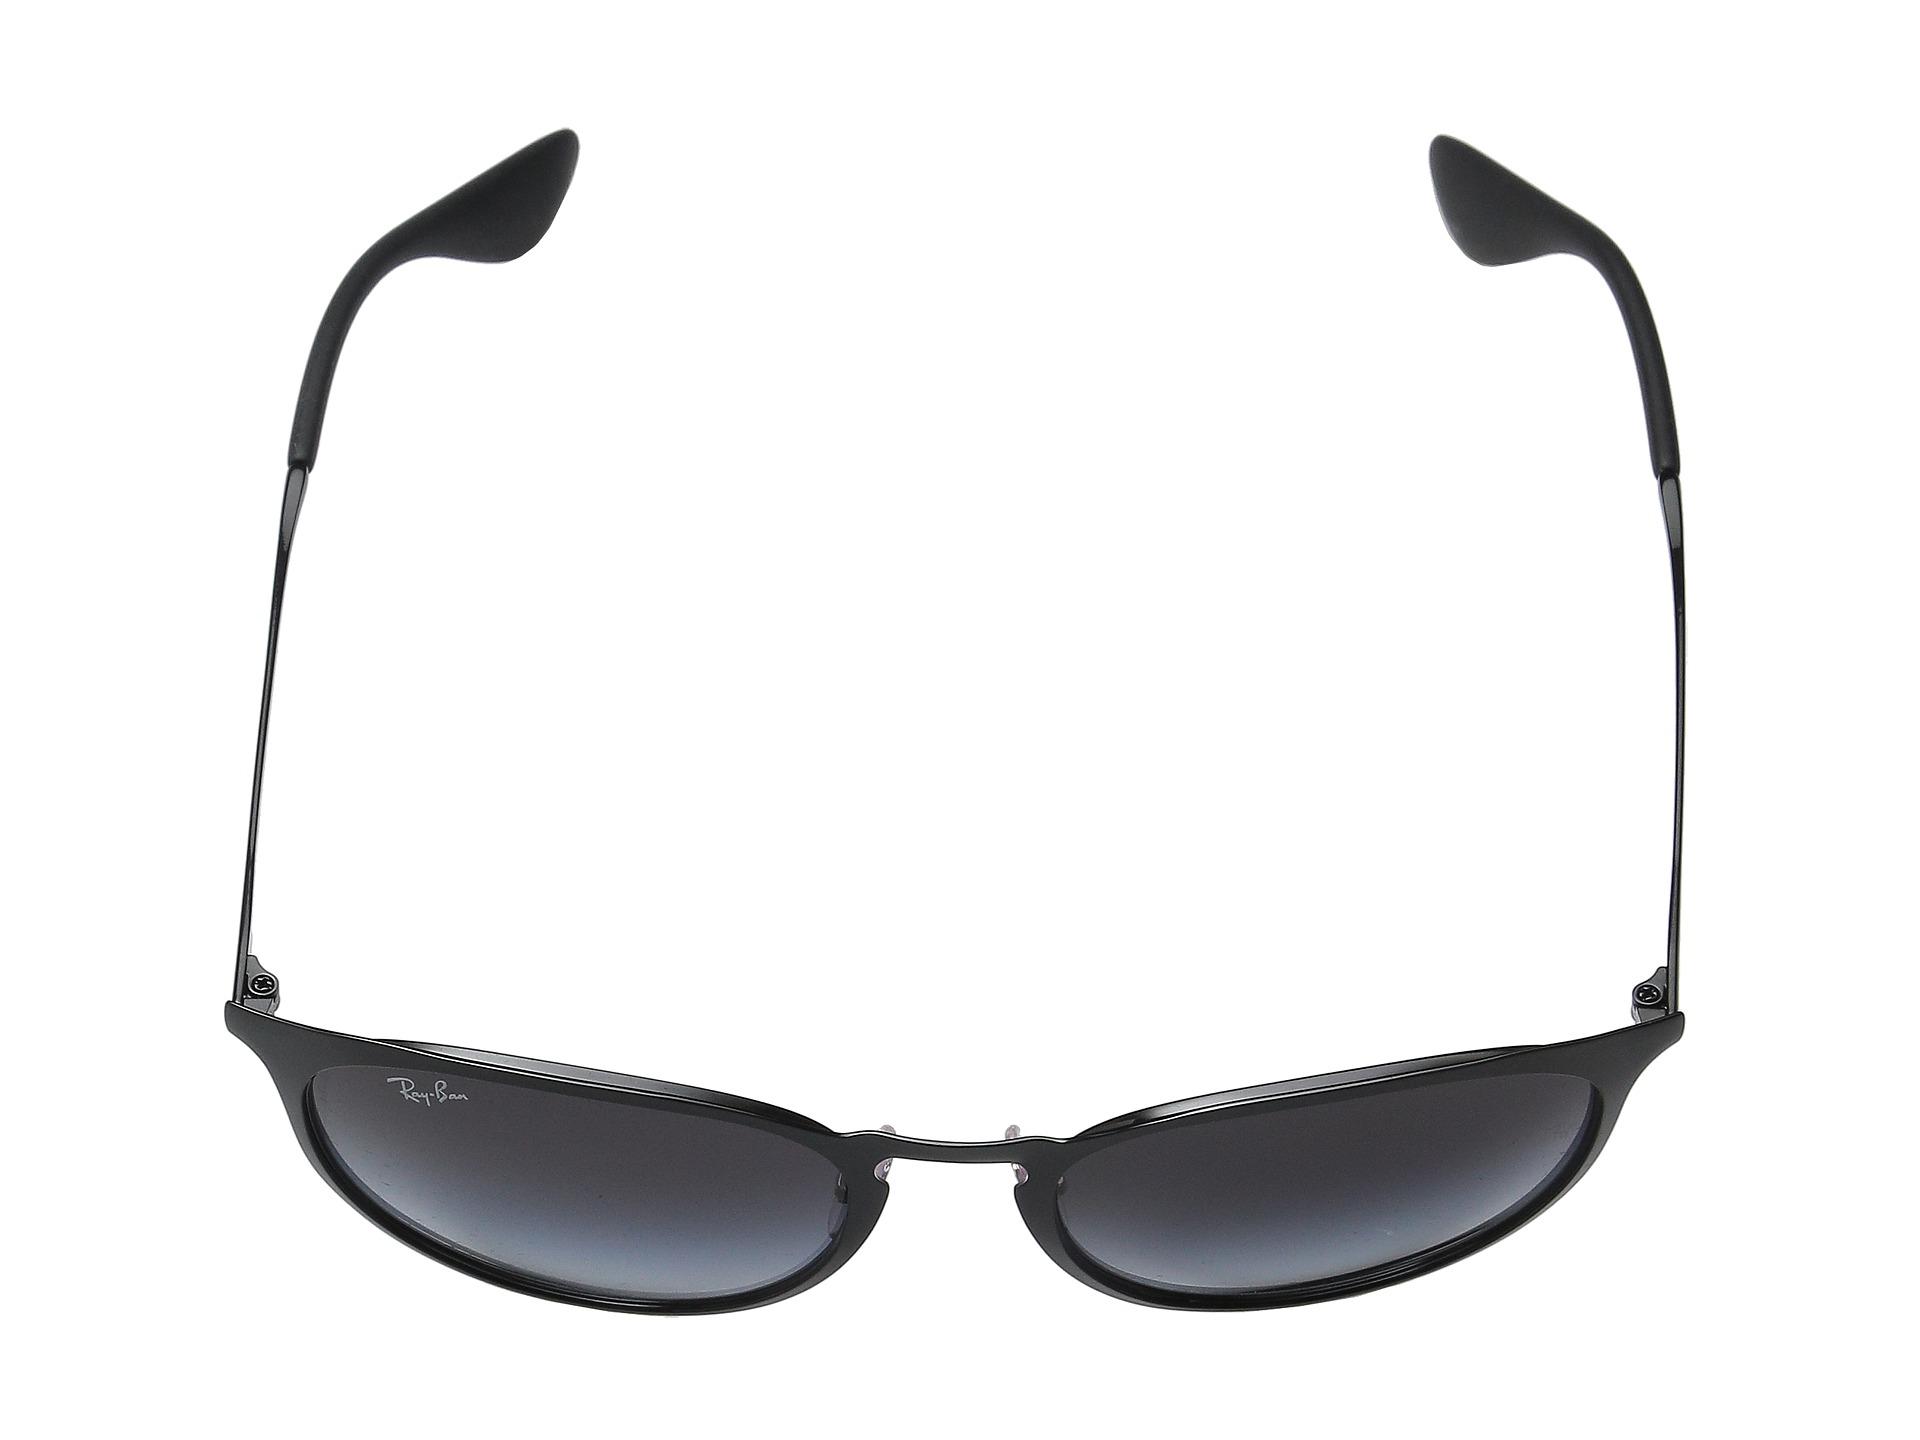 dd42d59c2a1b Plastic Arm Covers For Sunglasses